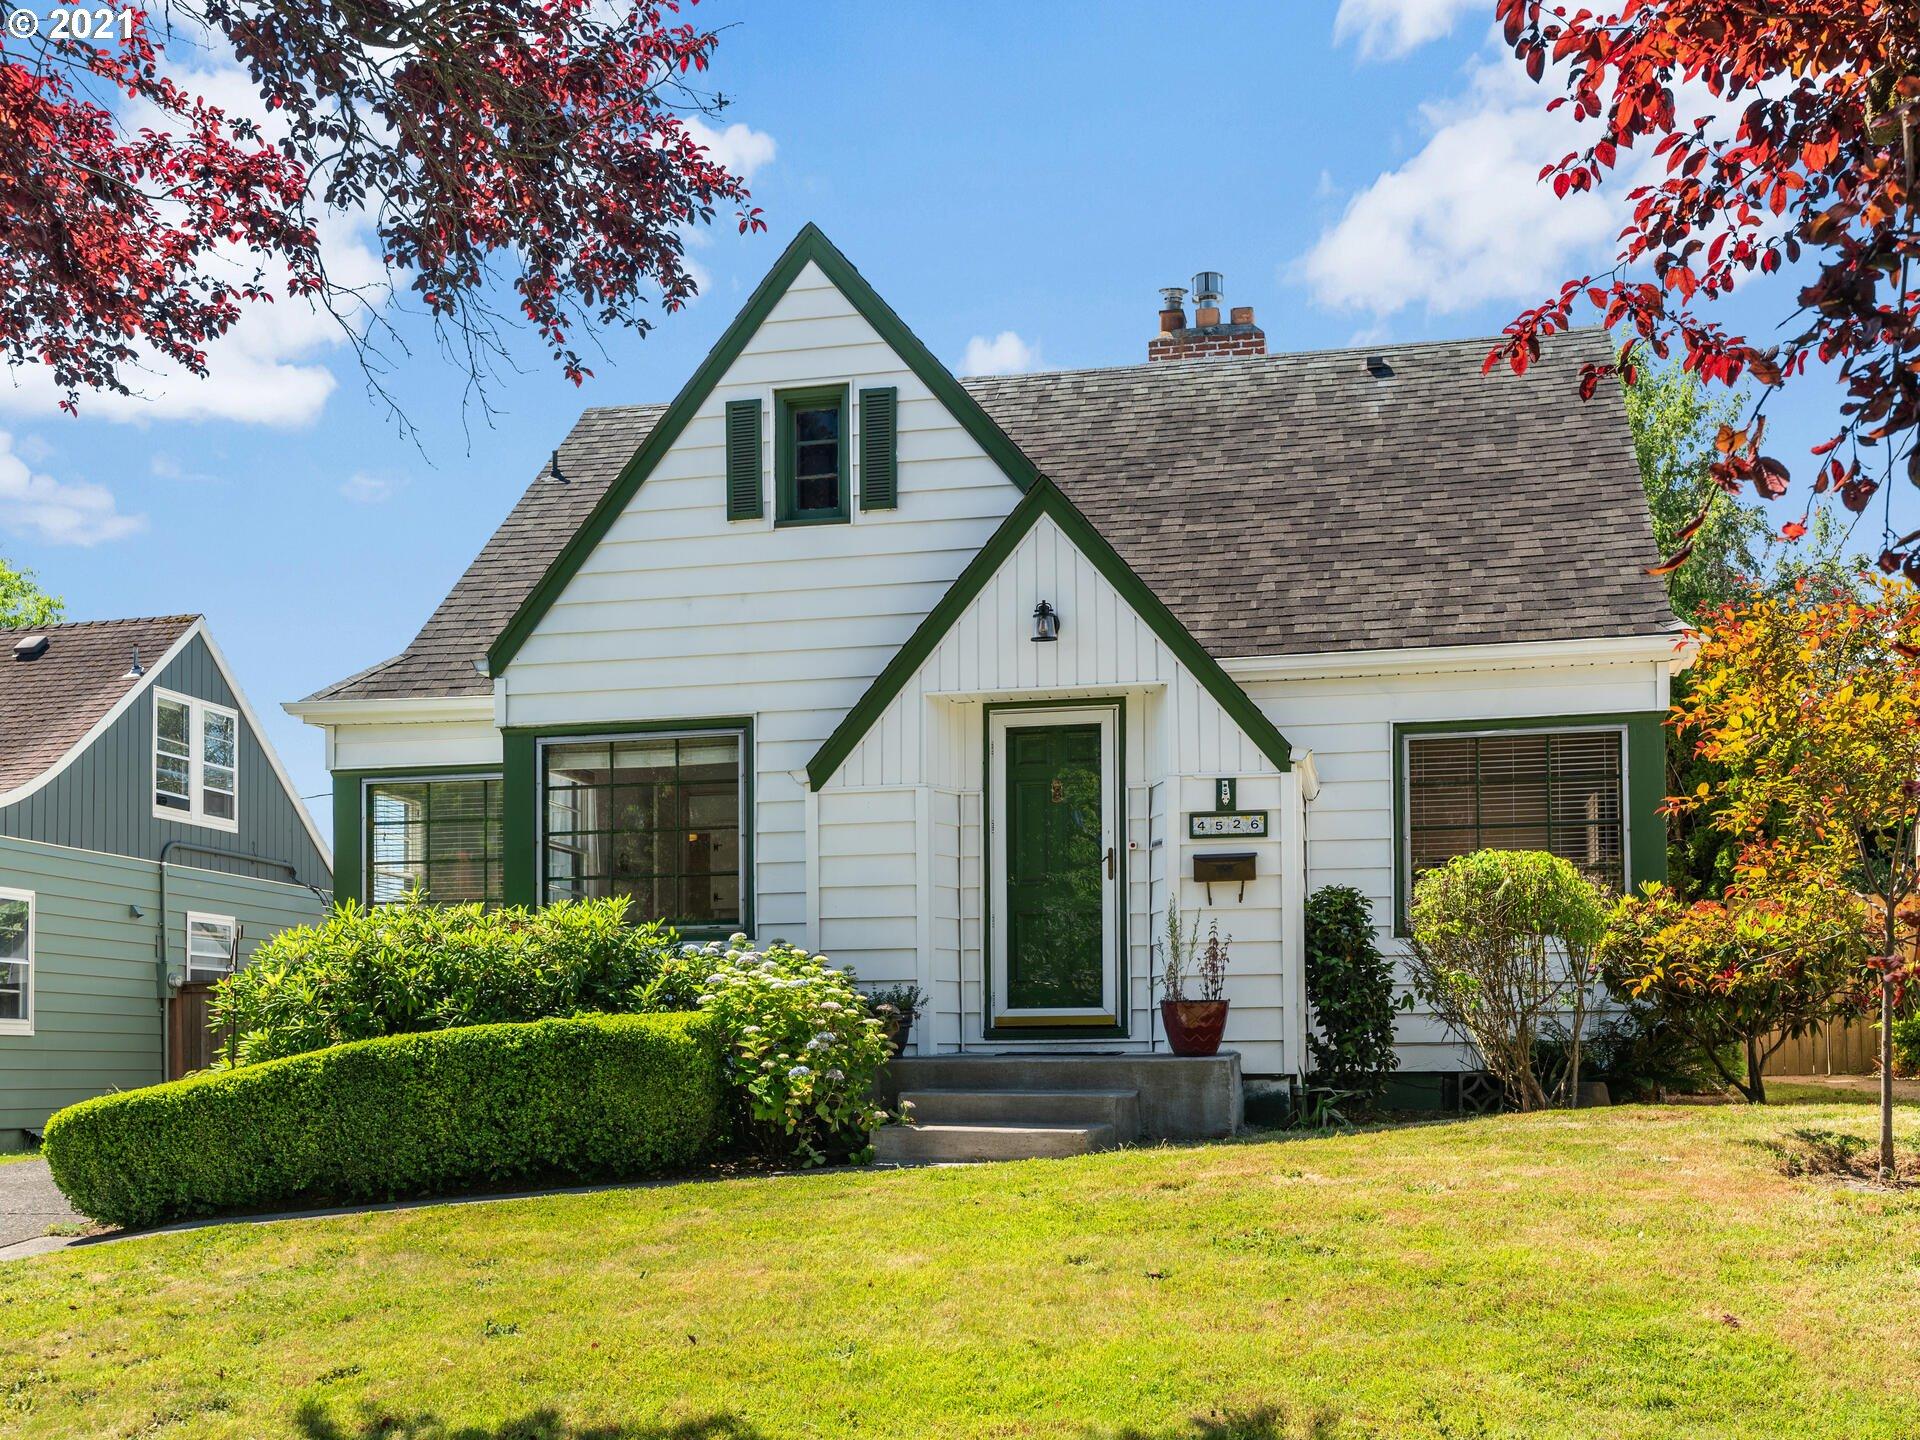 4526 NE OREGON ST, Portland OR 97213